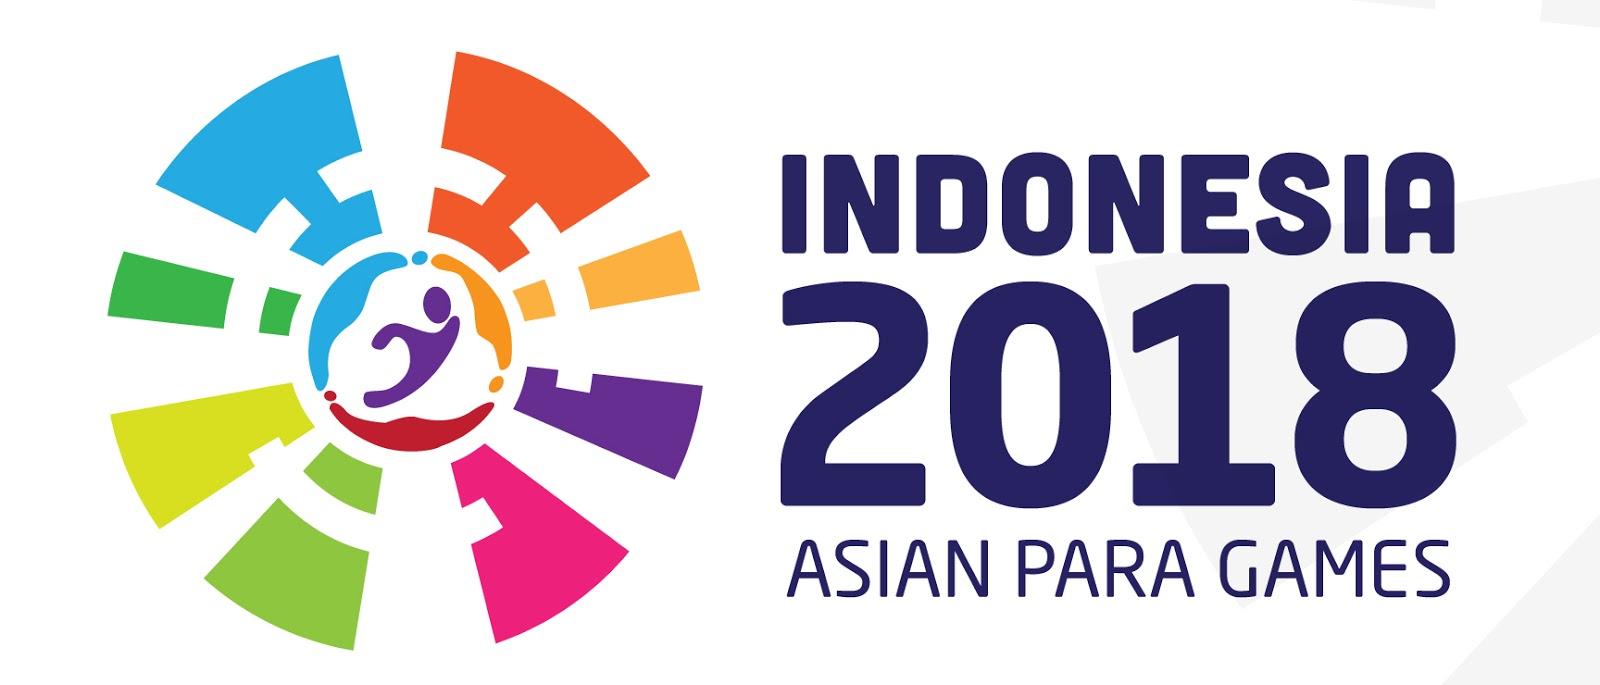 2018 asian games - photo #14